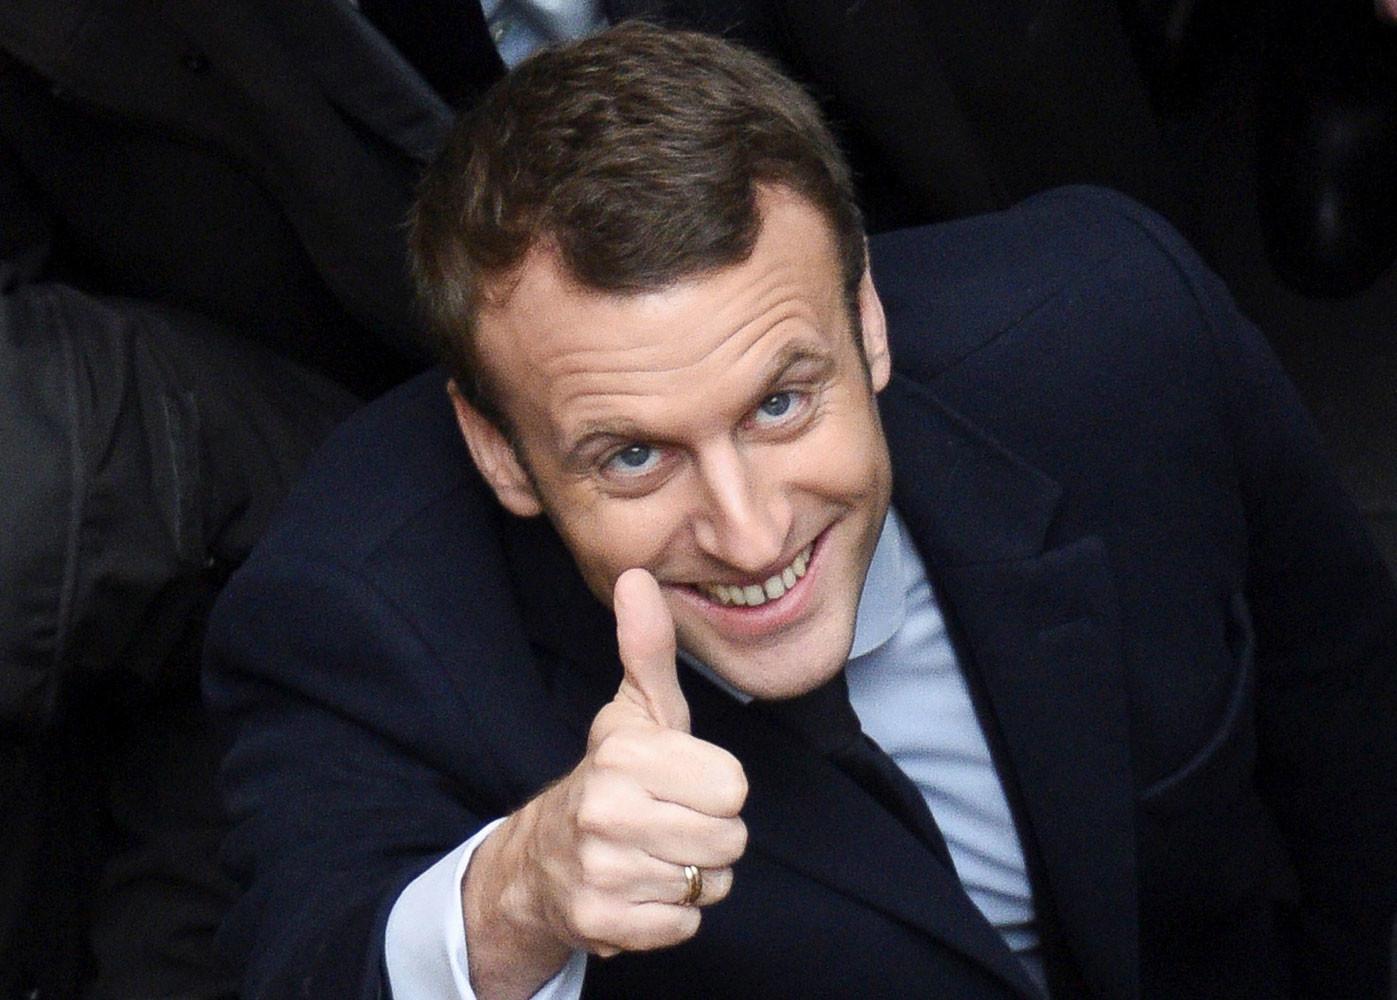 франция, макрон, владимир путин, башар асад, сирия, политика